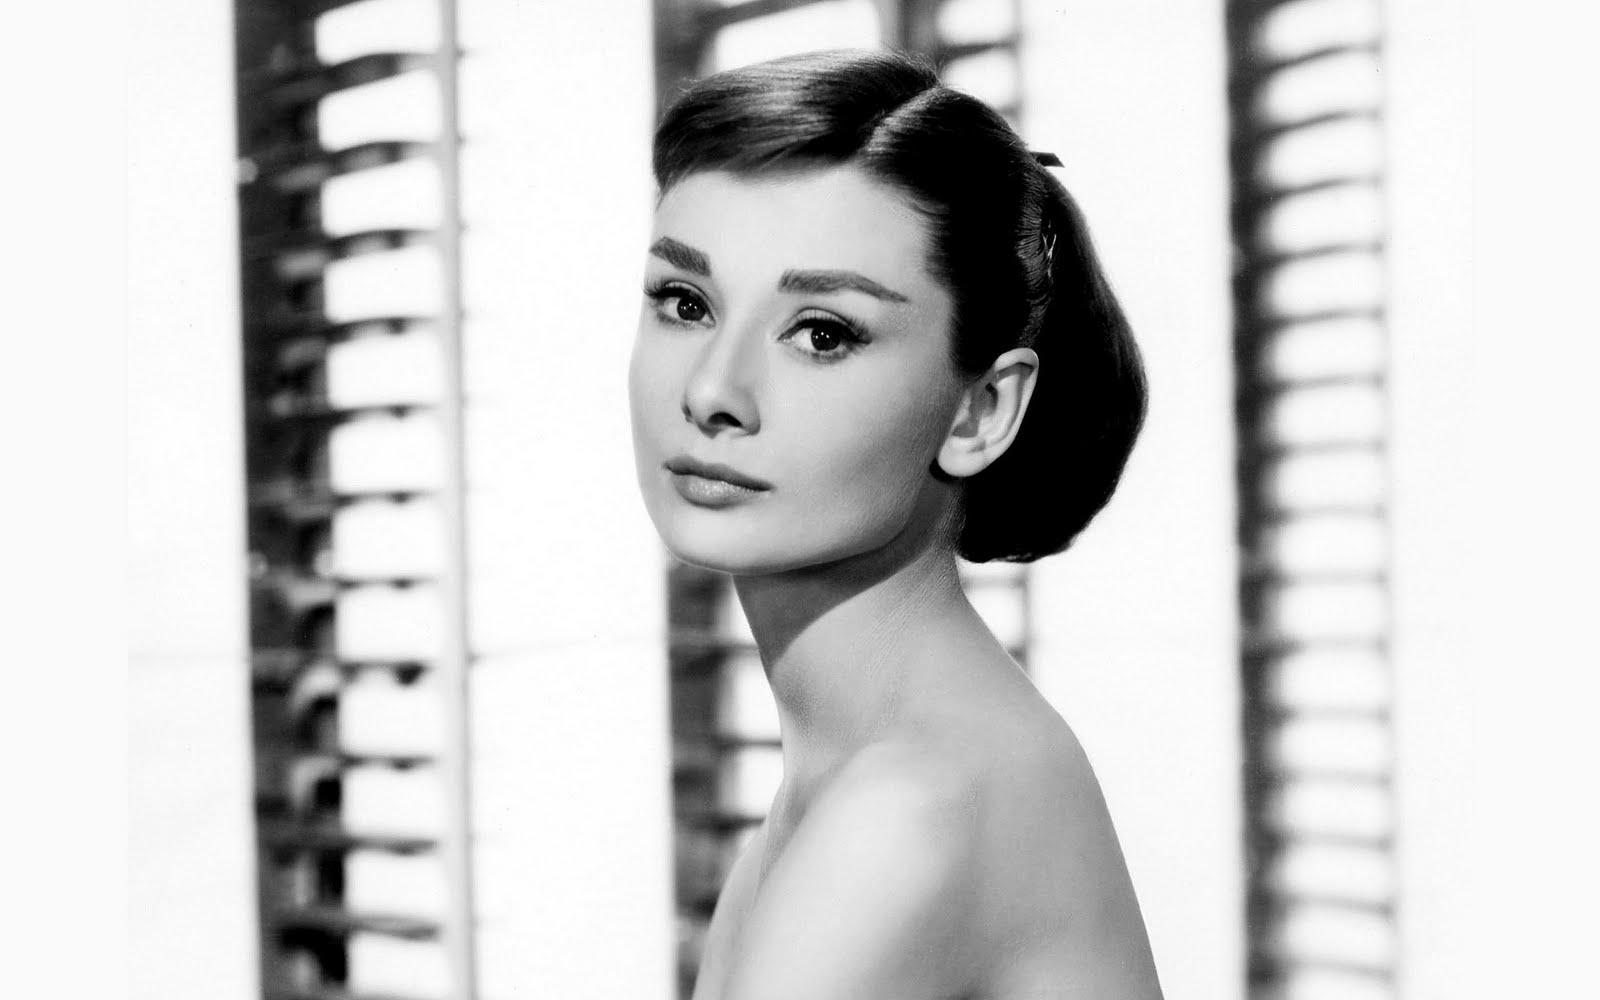 http://1.bp.blogspot.com/-H4KWsxYYapE/Tb-juKcR11I/AAAAAAAABRE/qjRktJu6v_0/s1600/Audrey-Hepburn-was-fucking-gorgeous.jpg